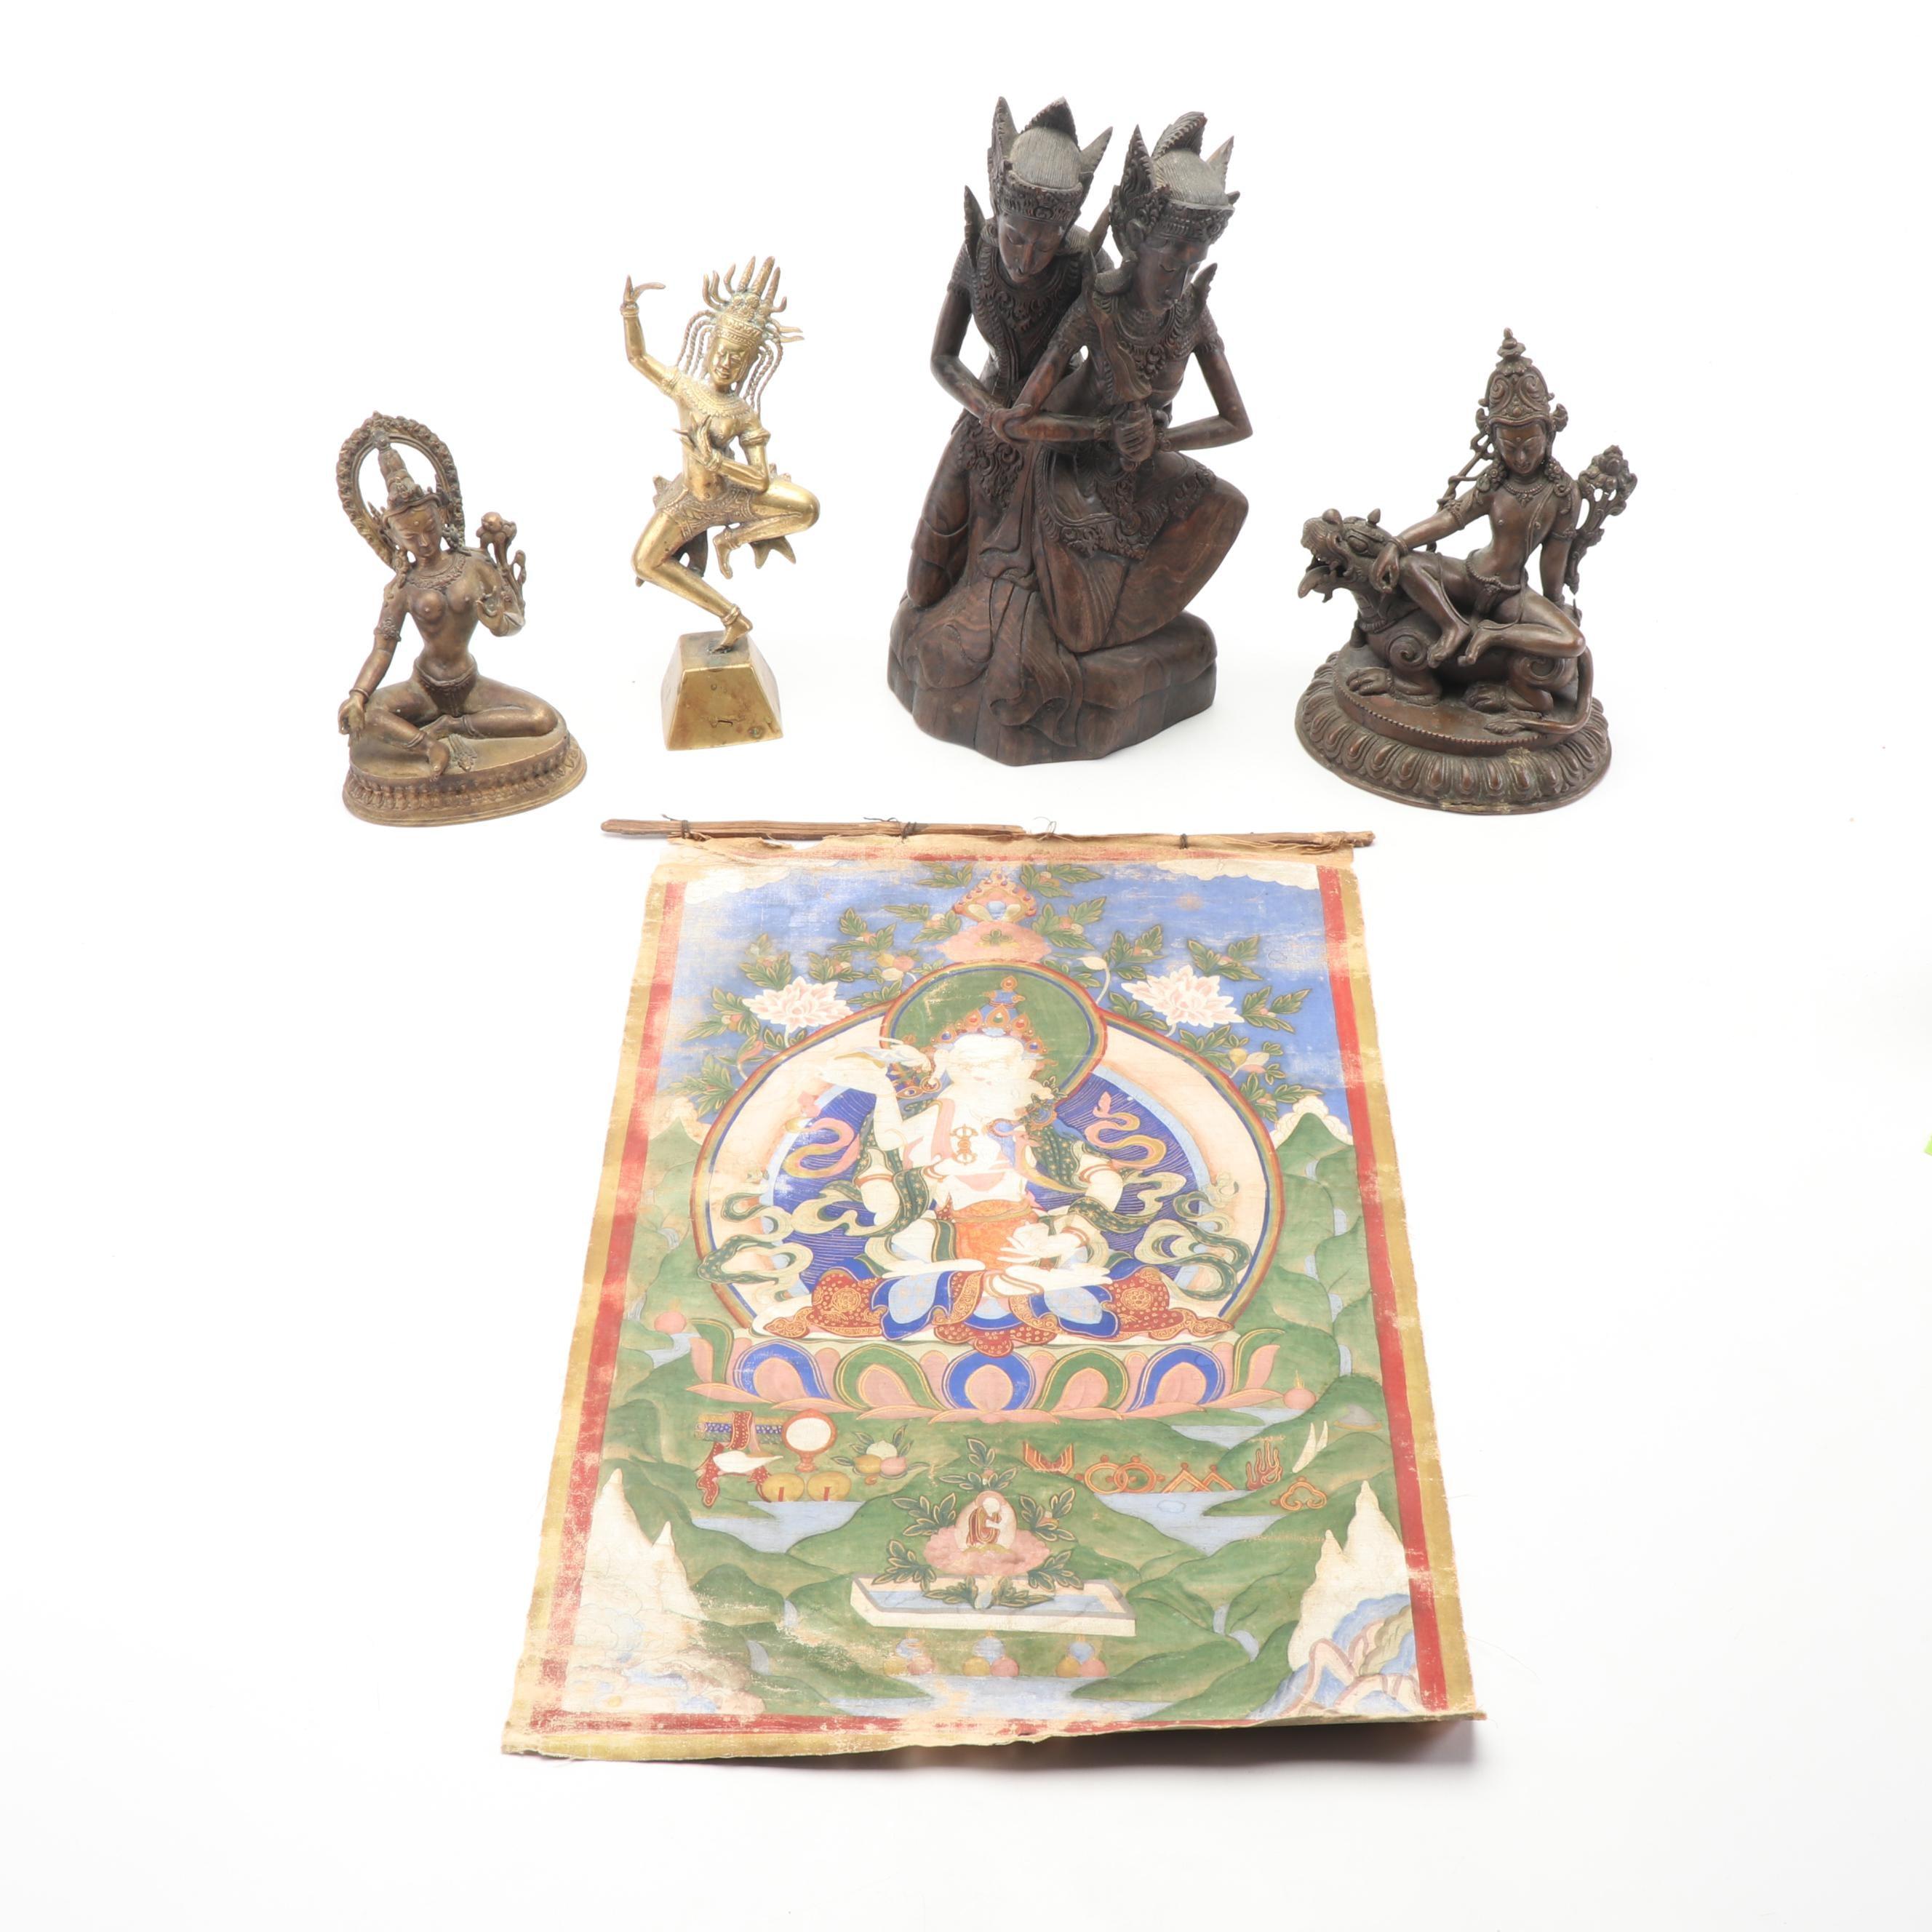 Tibetan Vajrasattva Yab-Yum Thangka with Tibetan and Southeast Asian Figurines